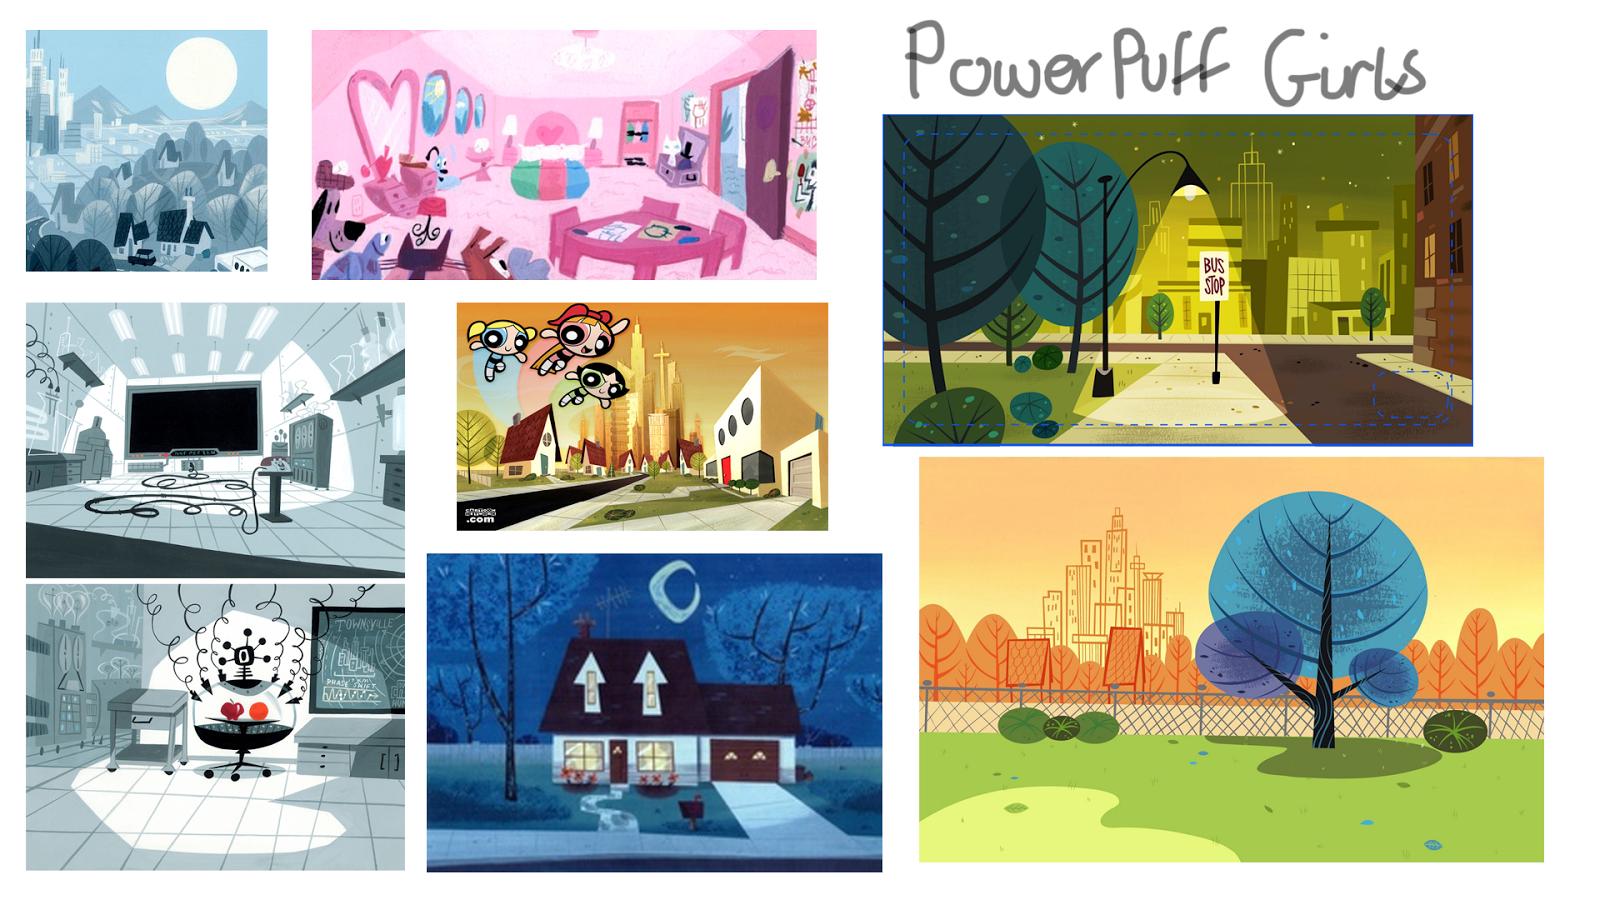 Powerpuff Girls Bedroom Animation Principles May 2014